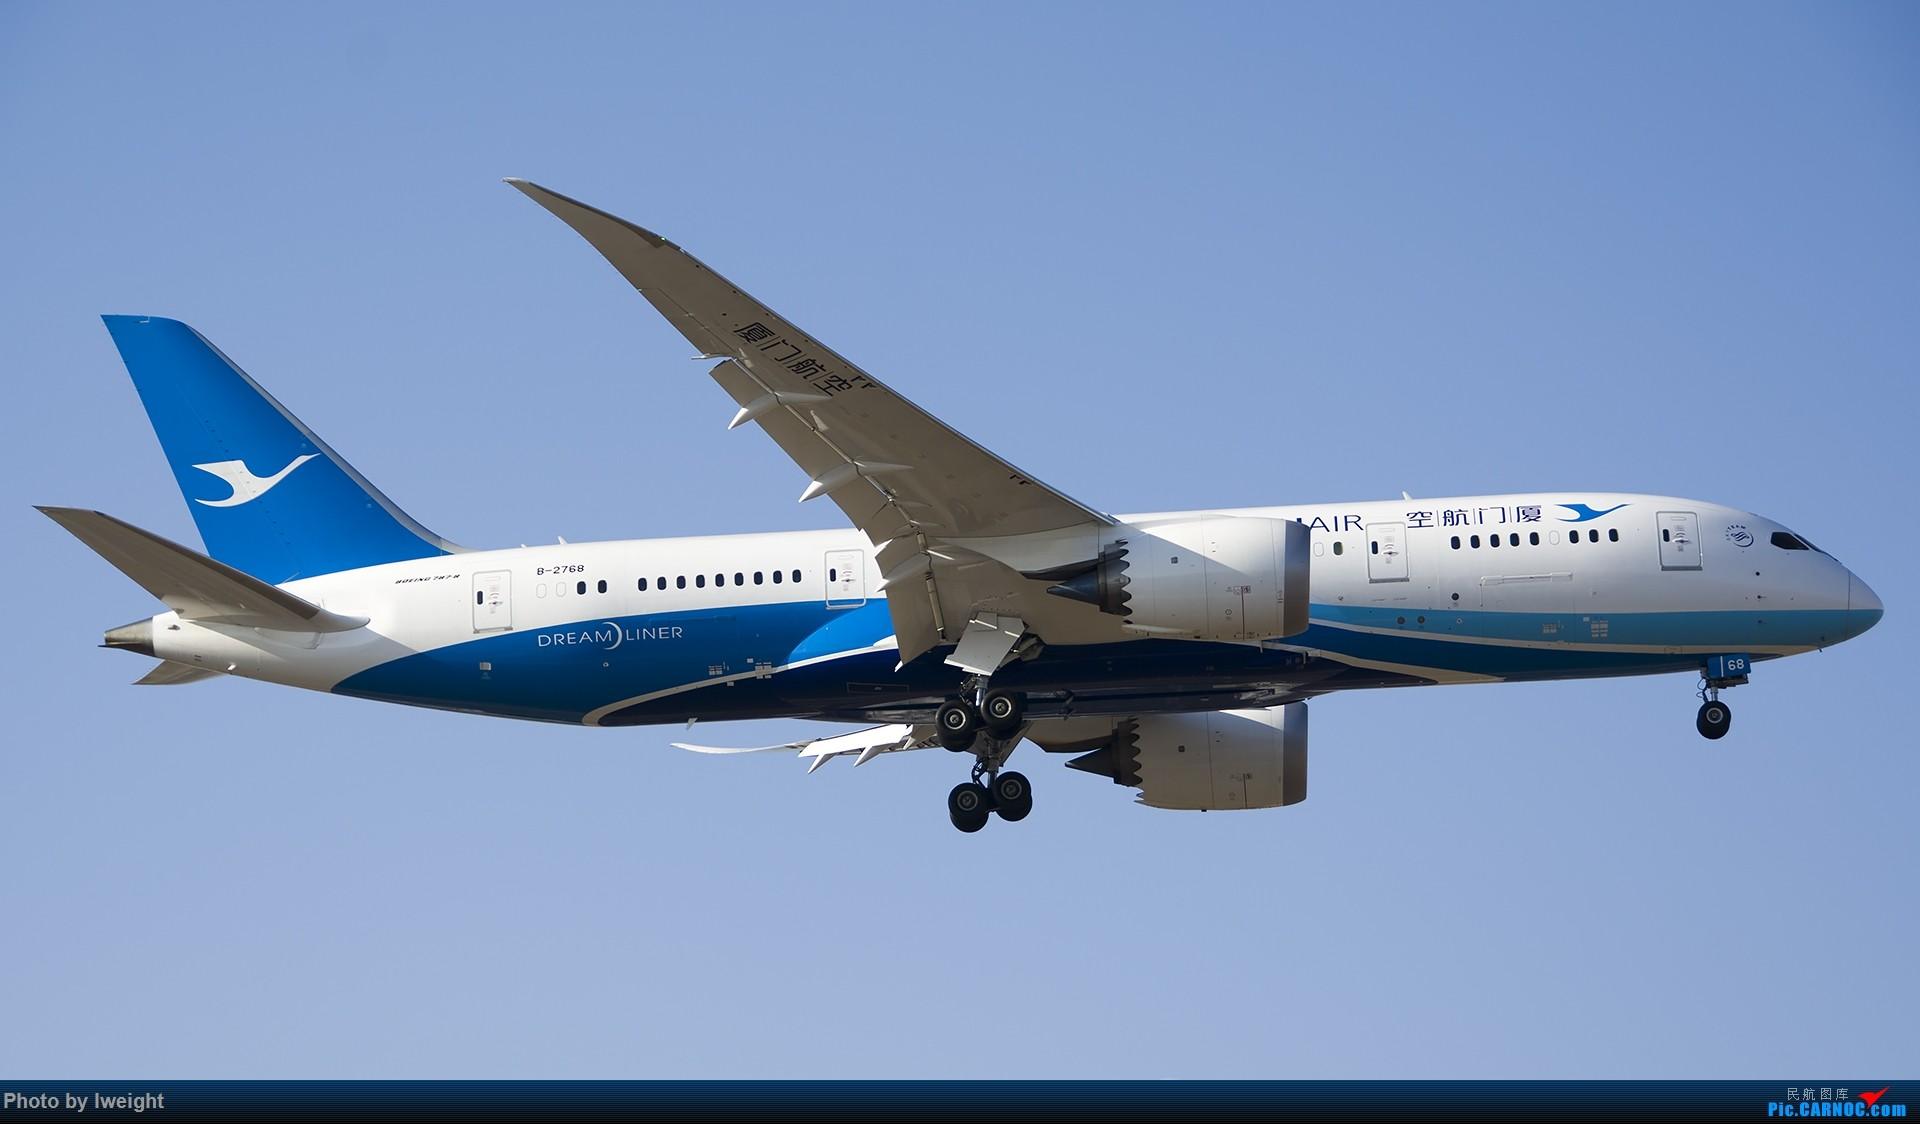 Re:[原创]庆祝升级777,发上今天在首都机场拍的所有飞机【2014-12-14】 BOEING 787-8 B-2768 中国北京首都国际机场